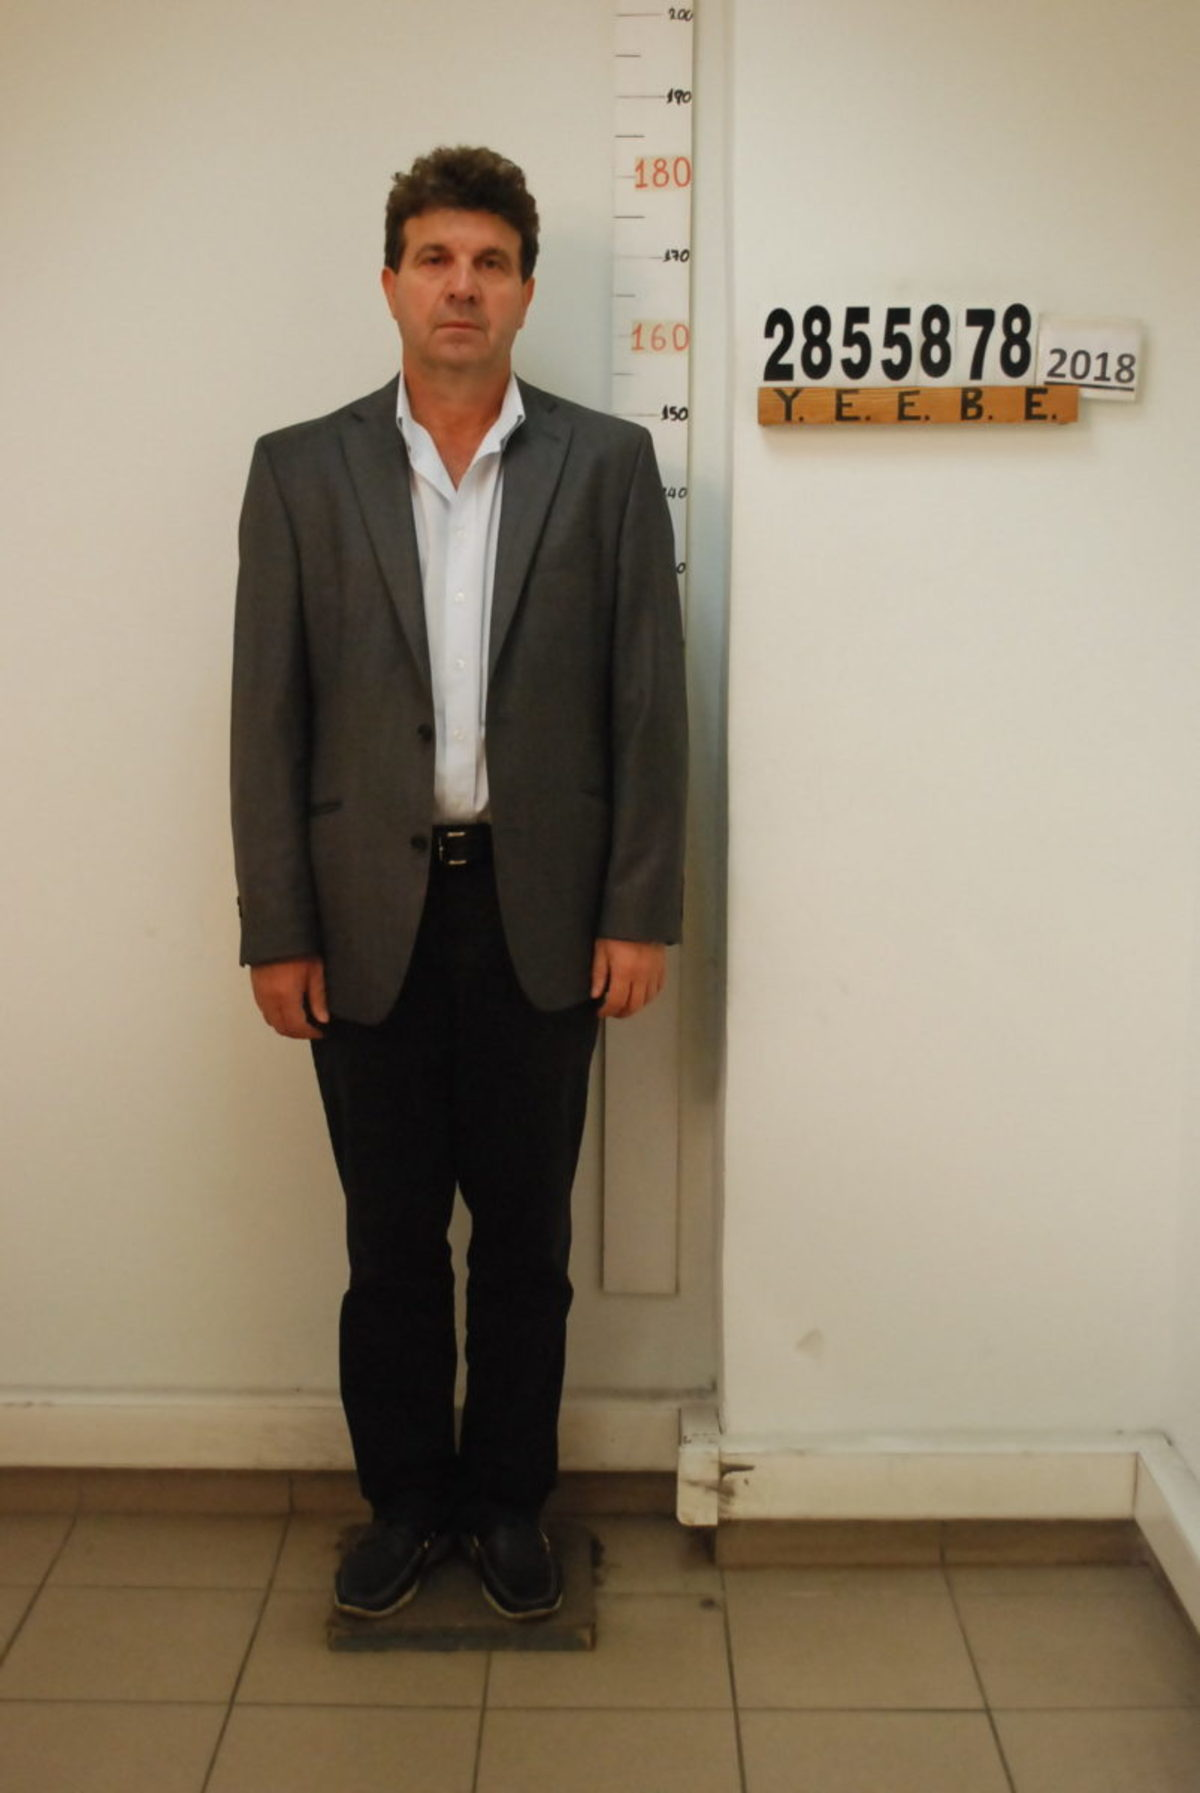 se4 - Αυτός είναι ο καθηγητής «Φακελάκης» στις Σέρρες – Φωτογραφίες και των φερόμενων ως συνεργών του